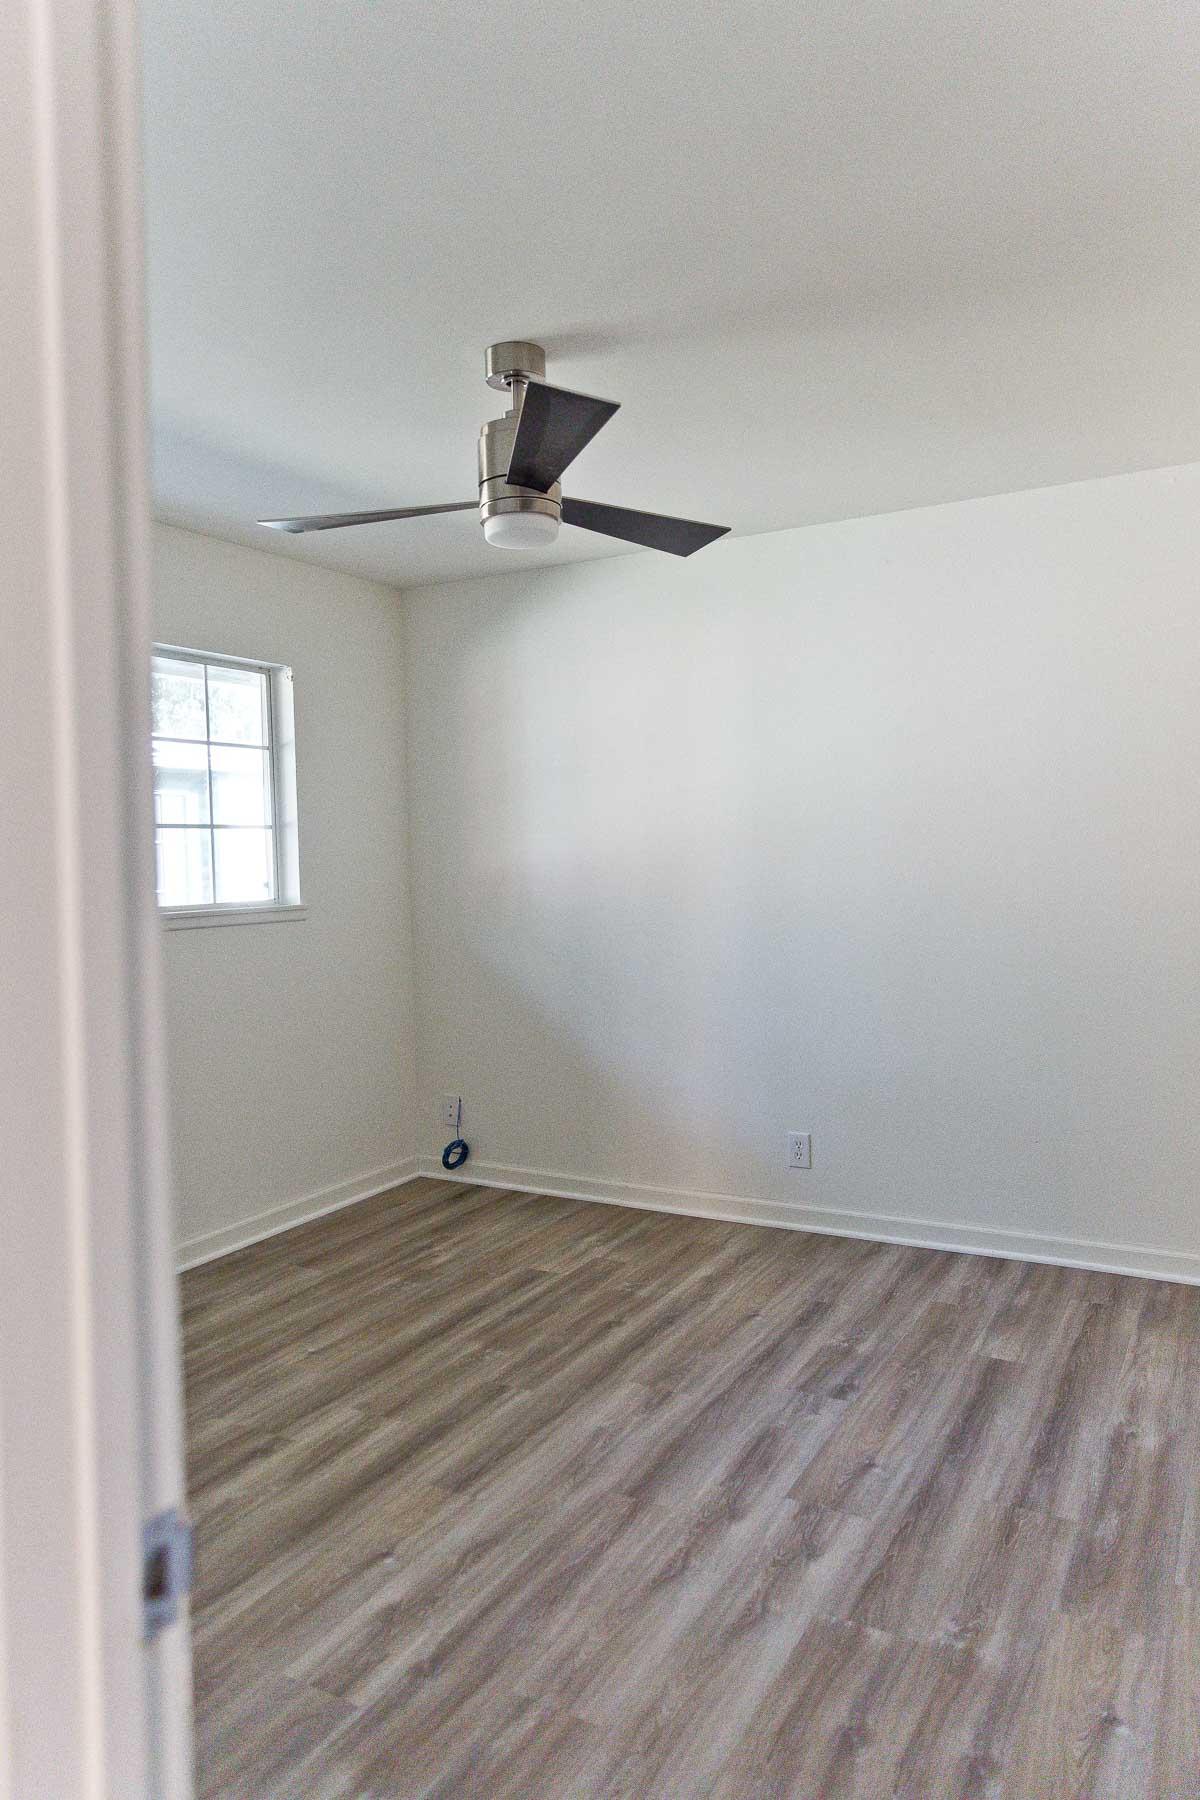 Photo of empty bedroom with modern ceiling fan.